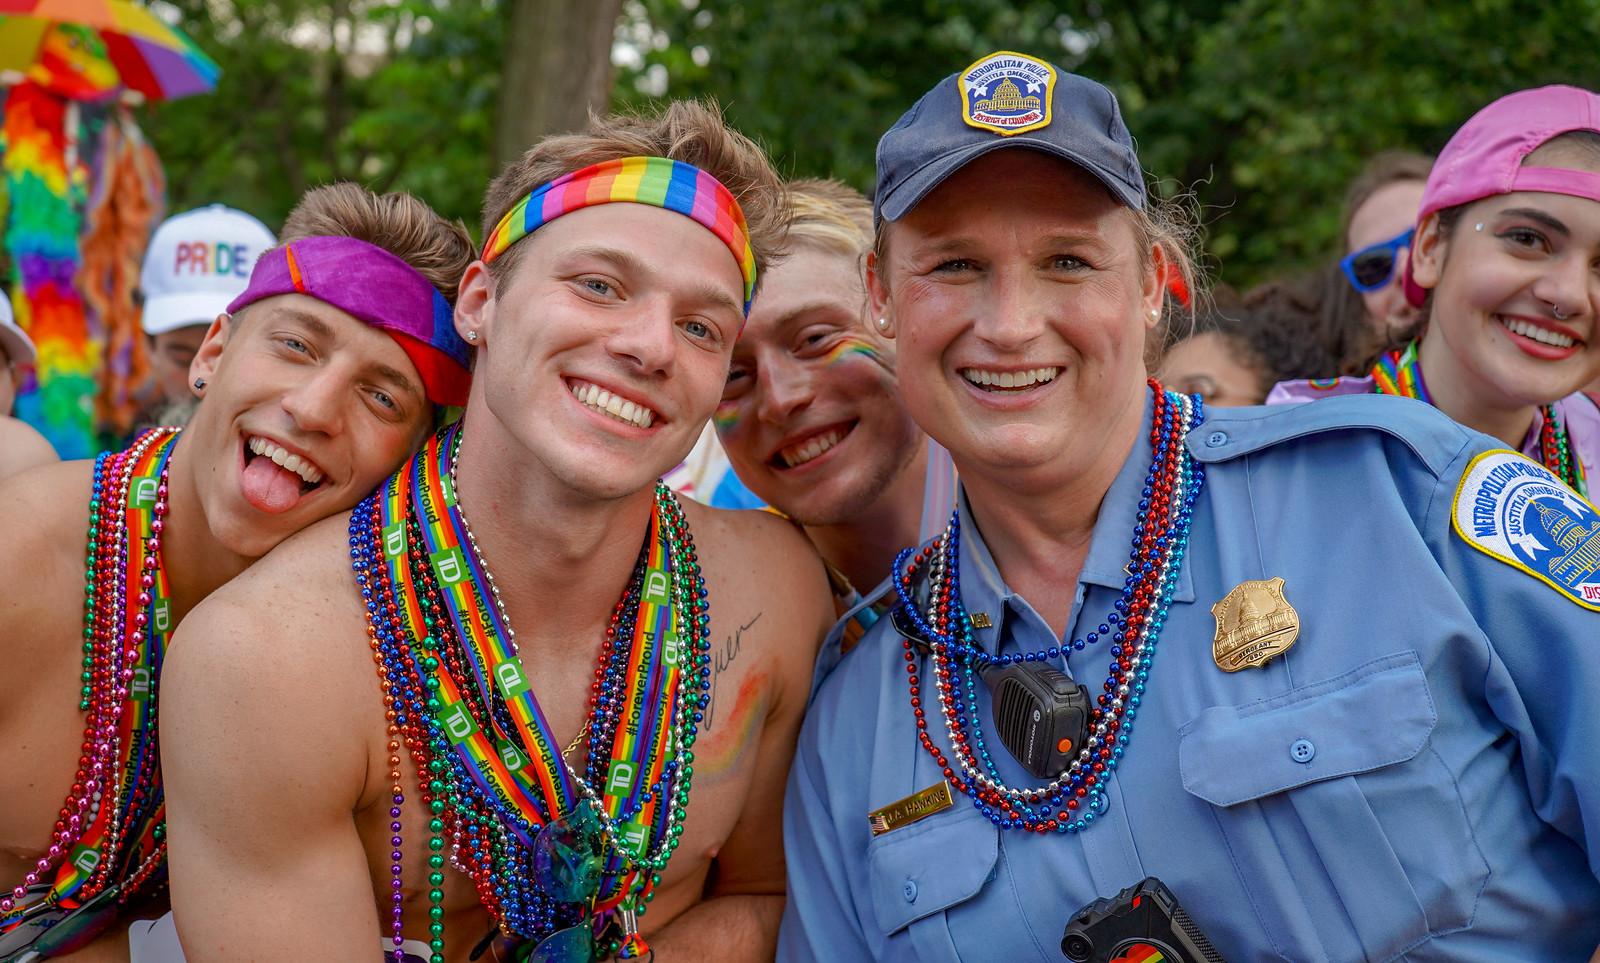 2018.06.09 Capital Pride Parade, Washington, DC USA 03230